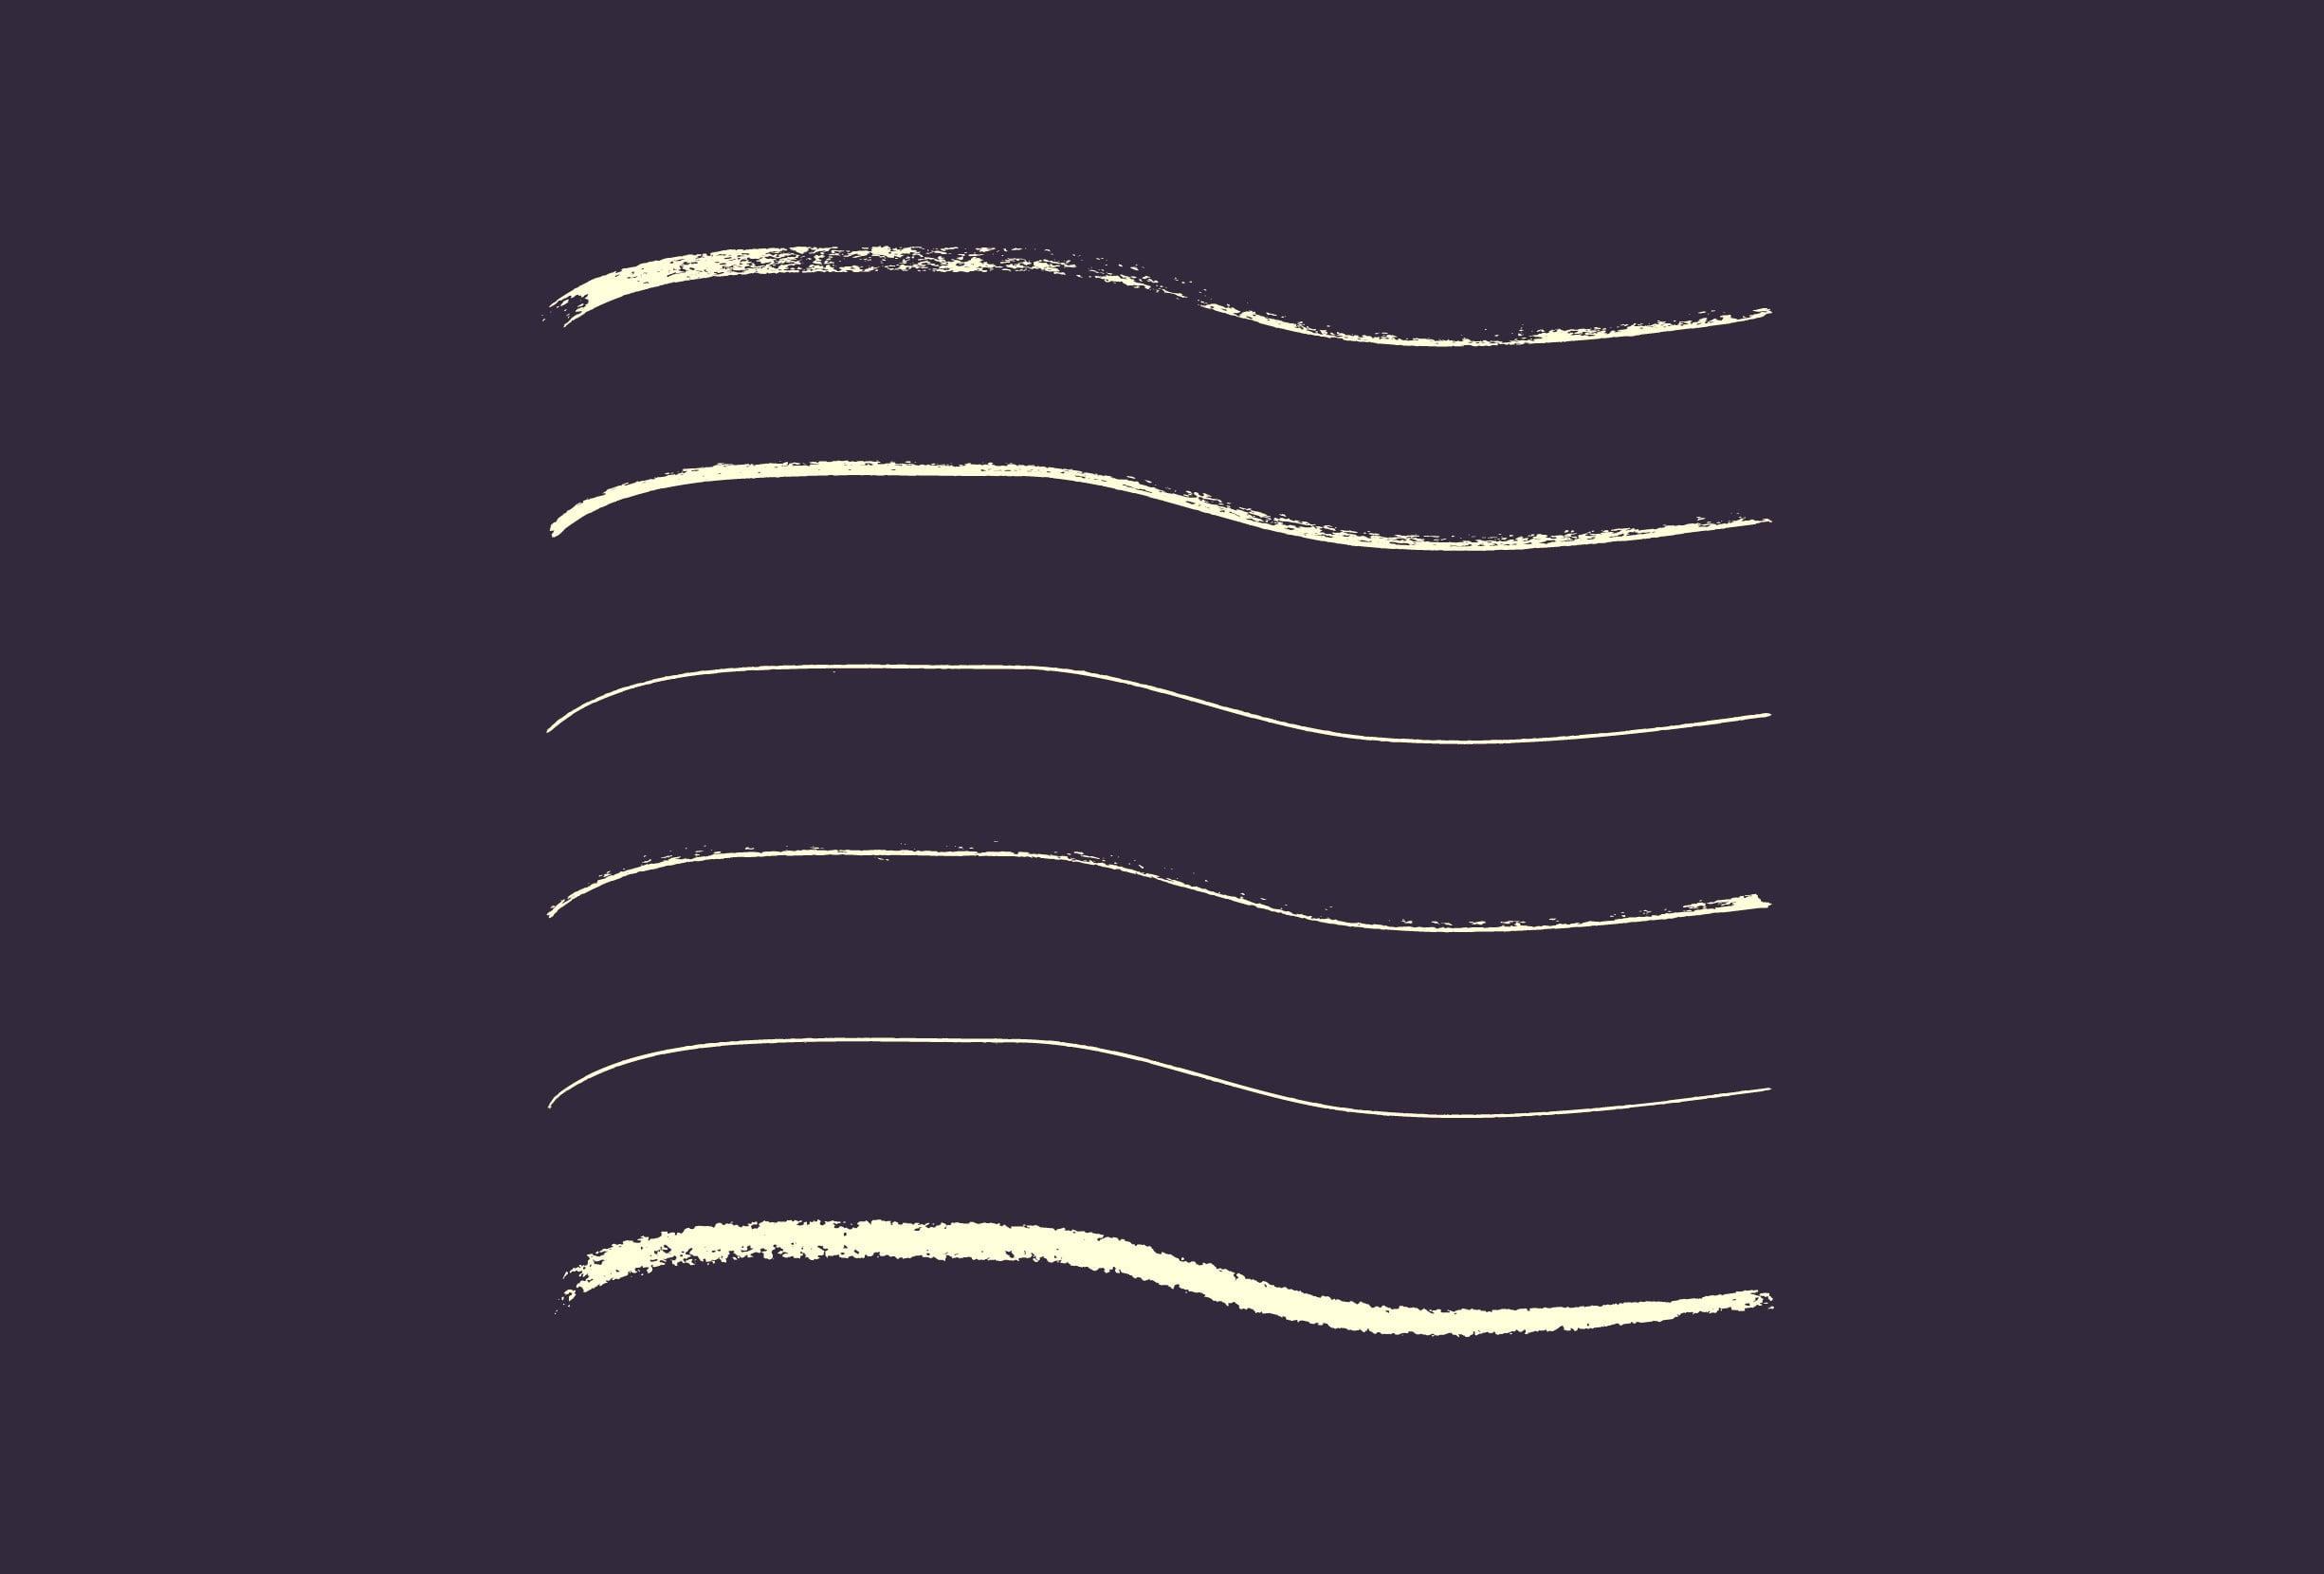 30 Best Line Art Illustrator Brushes (Wax Crayons) - brushes presentation 2 0